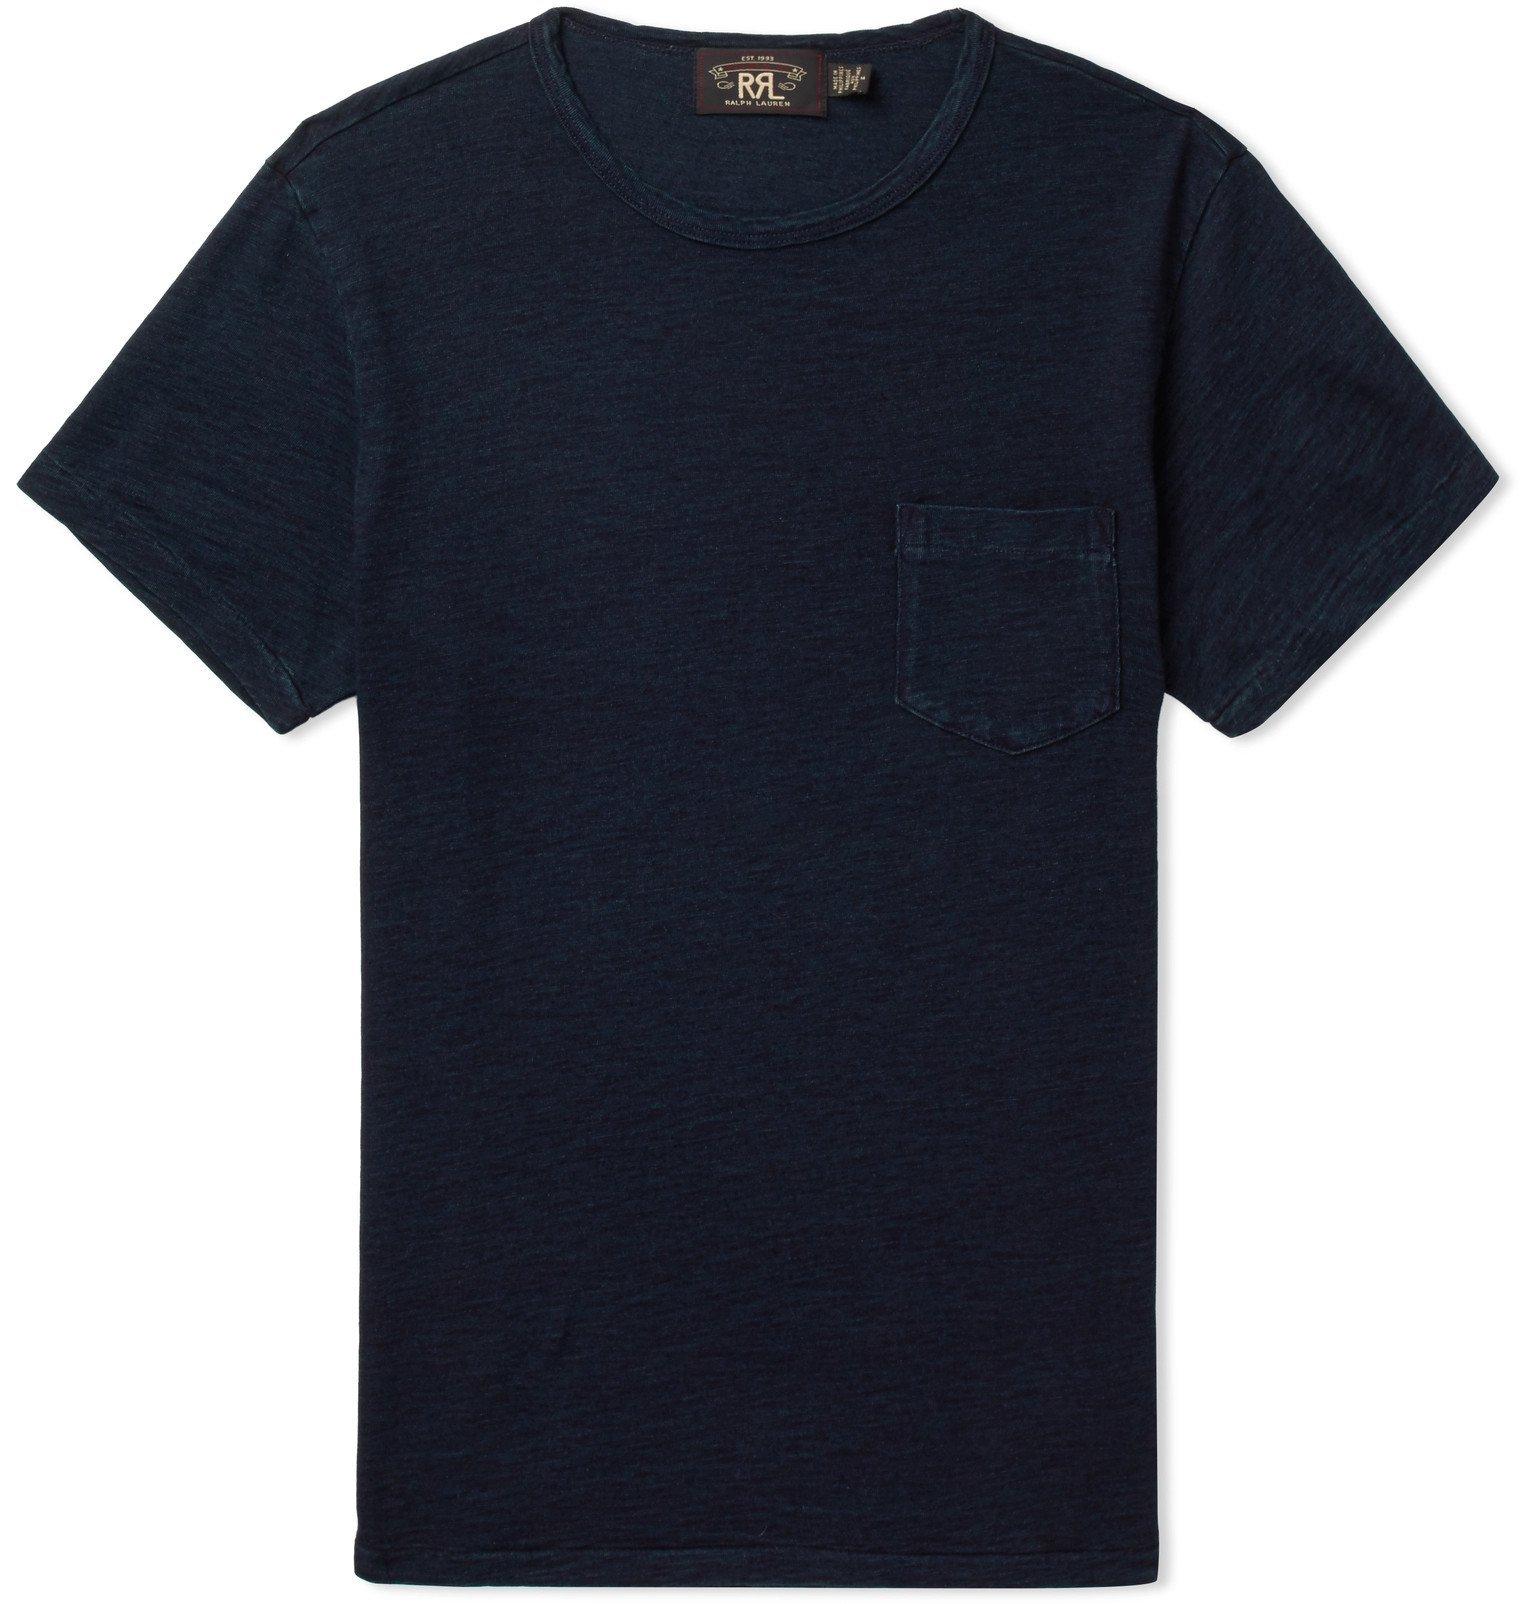 RRL - Indigo-Dyed Slub Cotton-Jersey T-Shirt - Blue